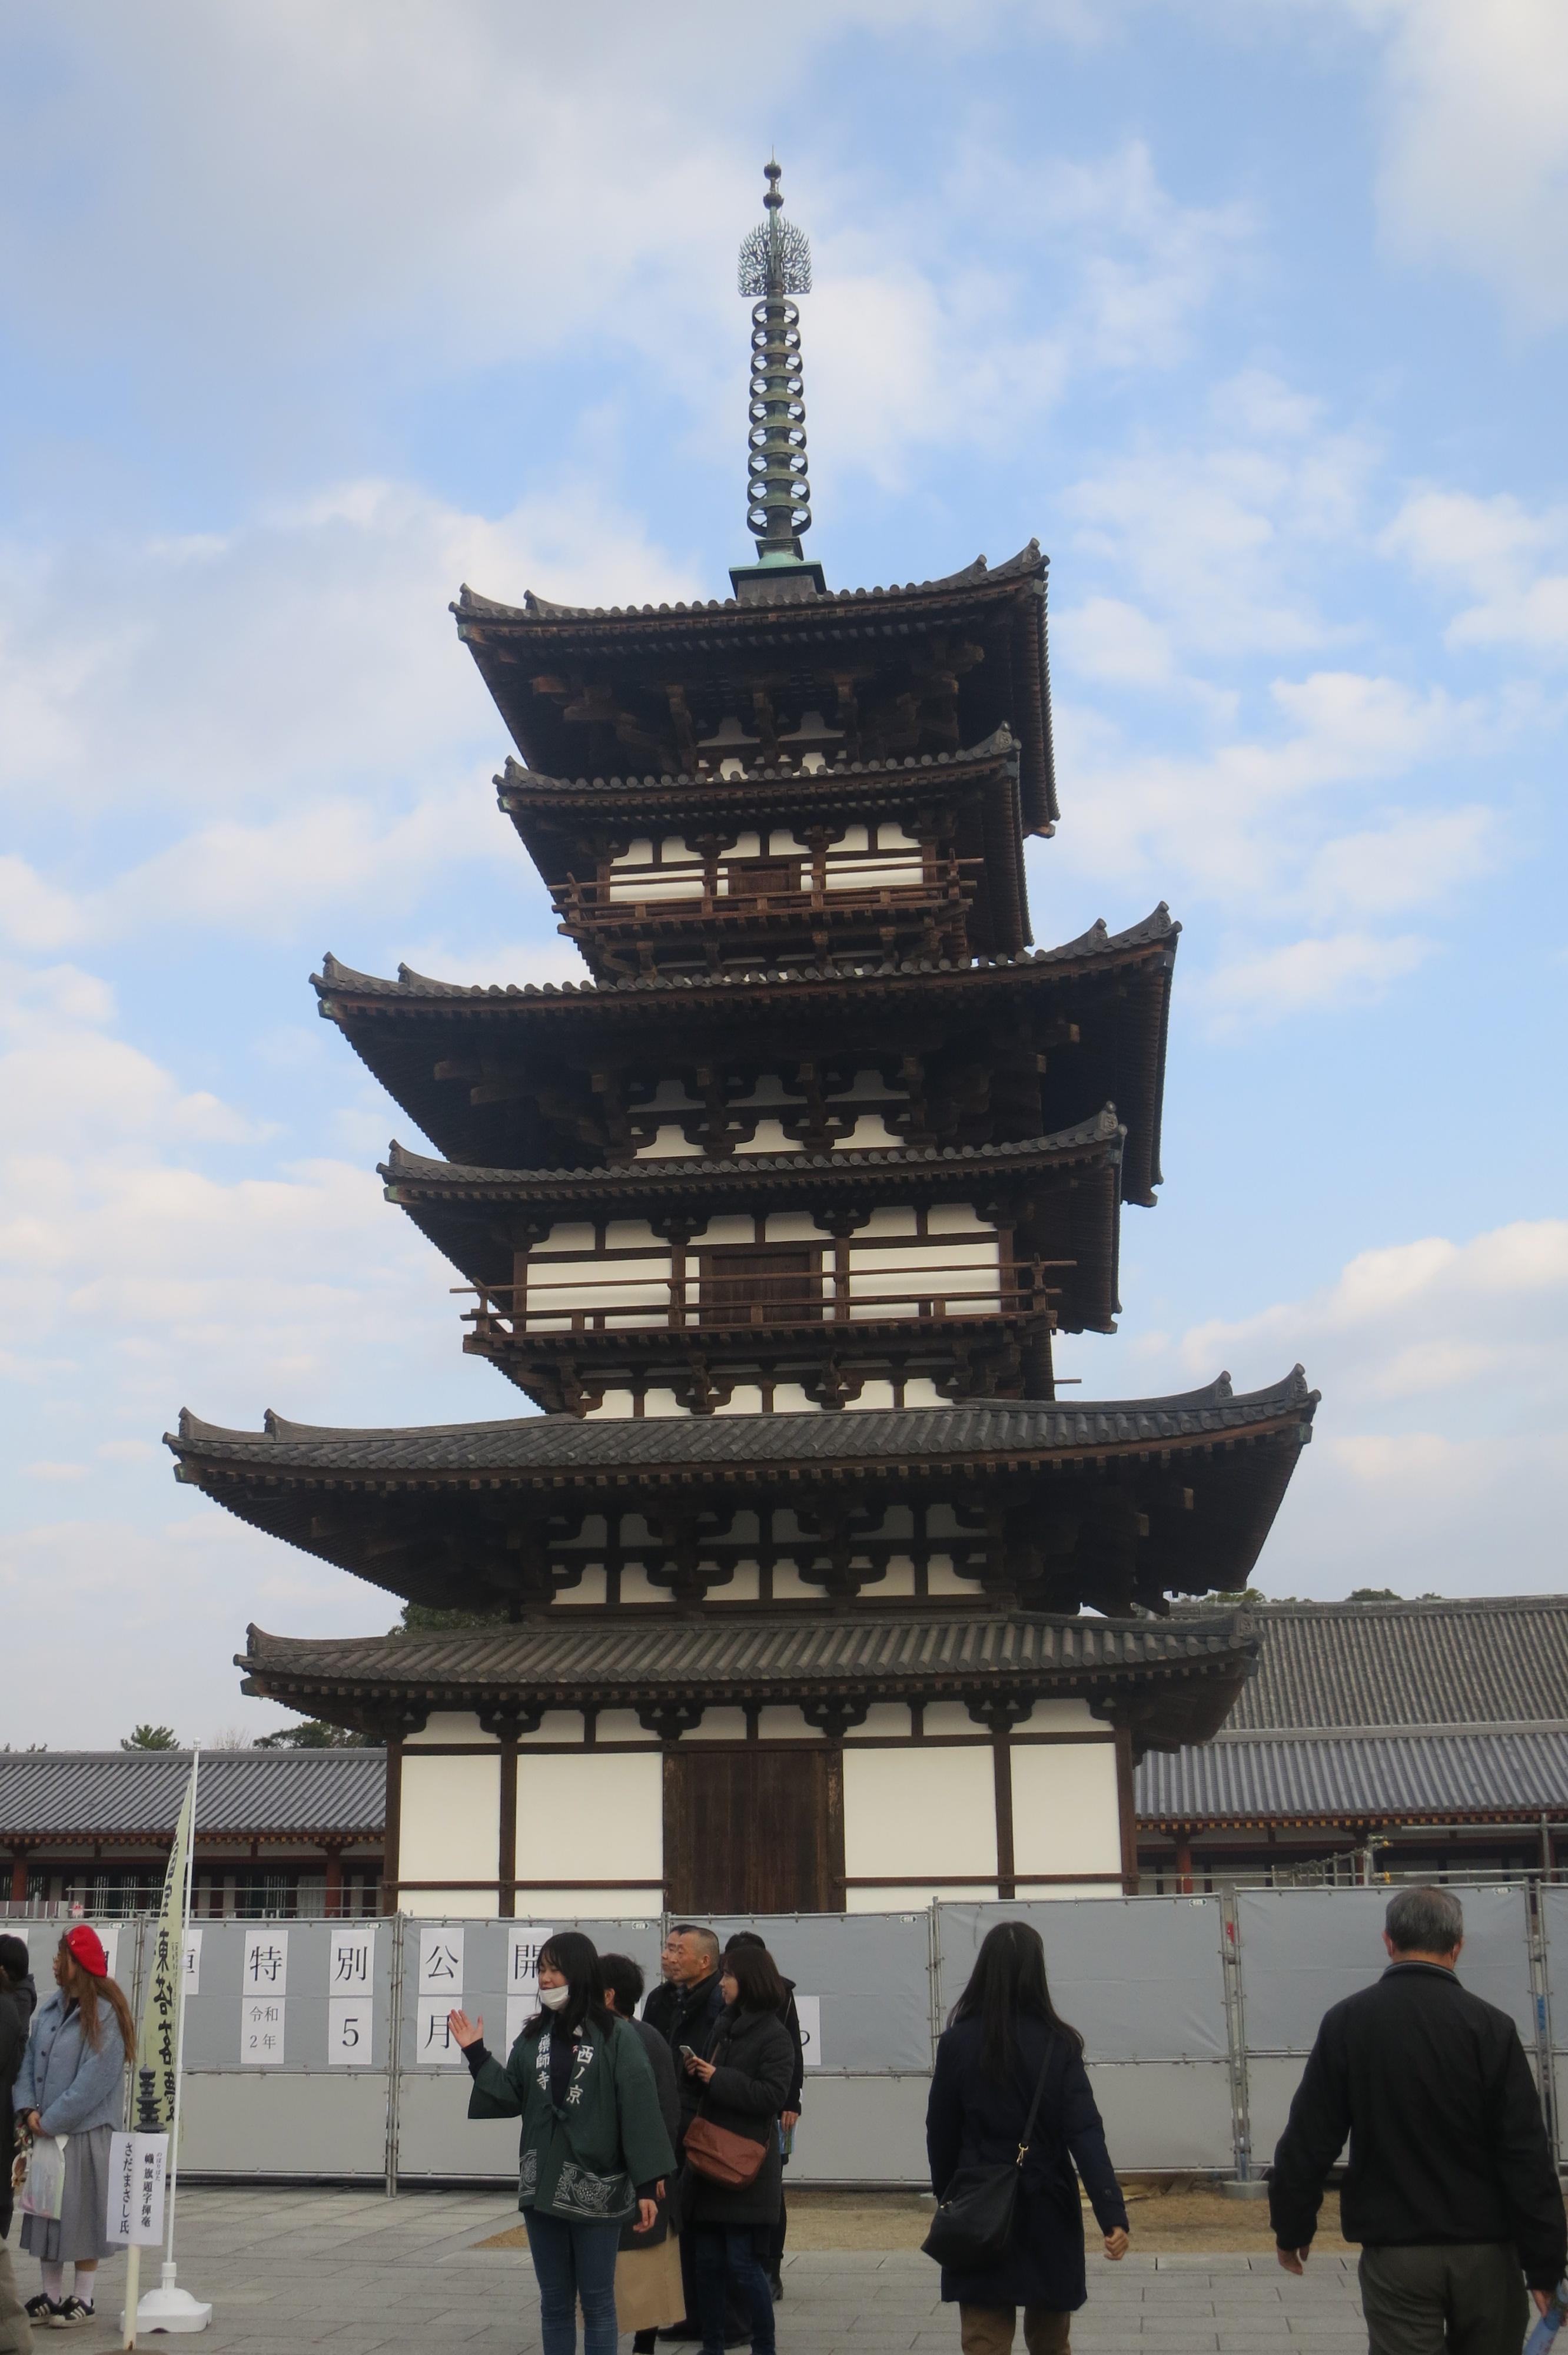 200121 薬師寺 東塔